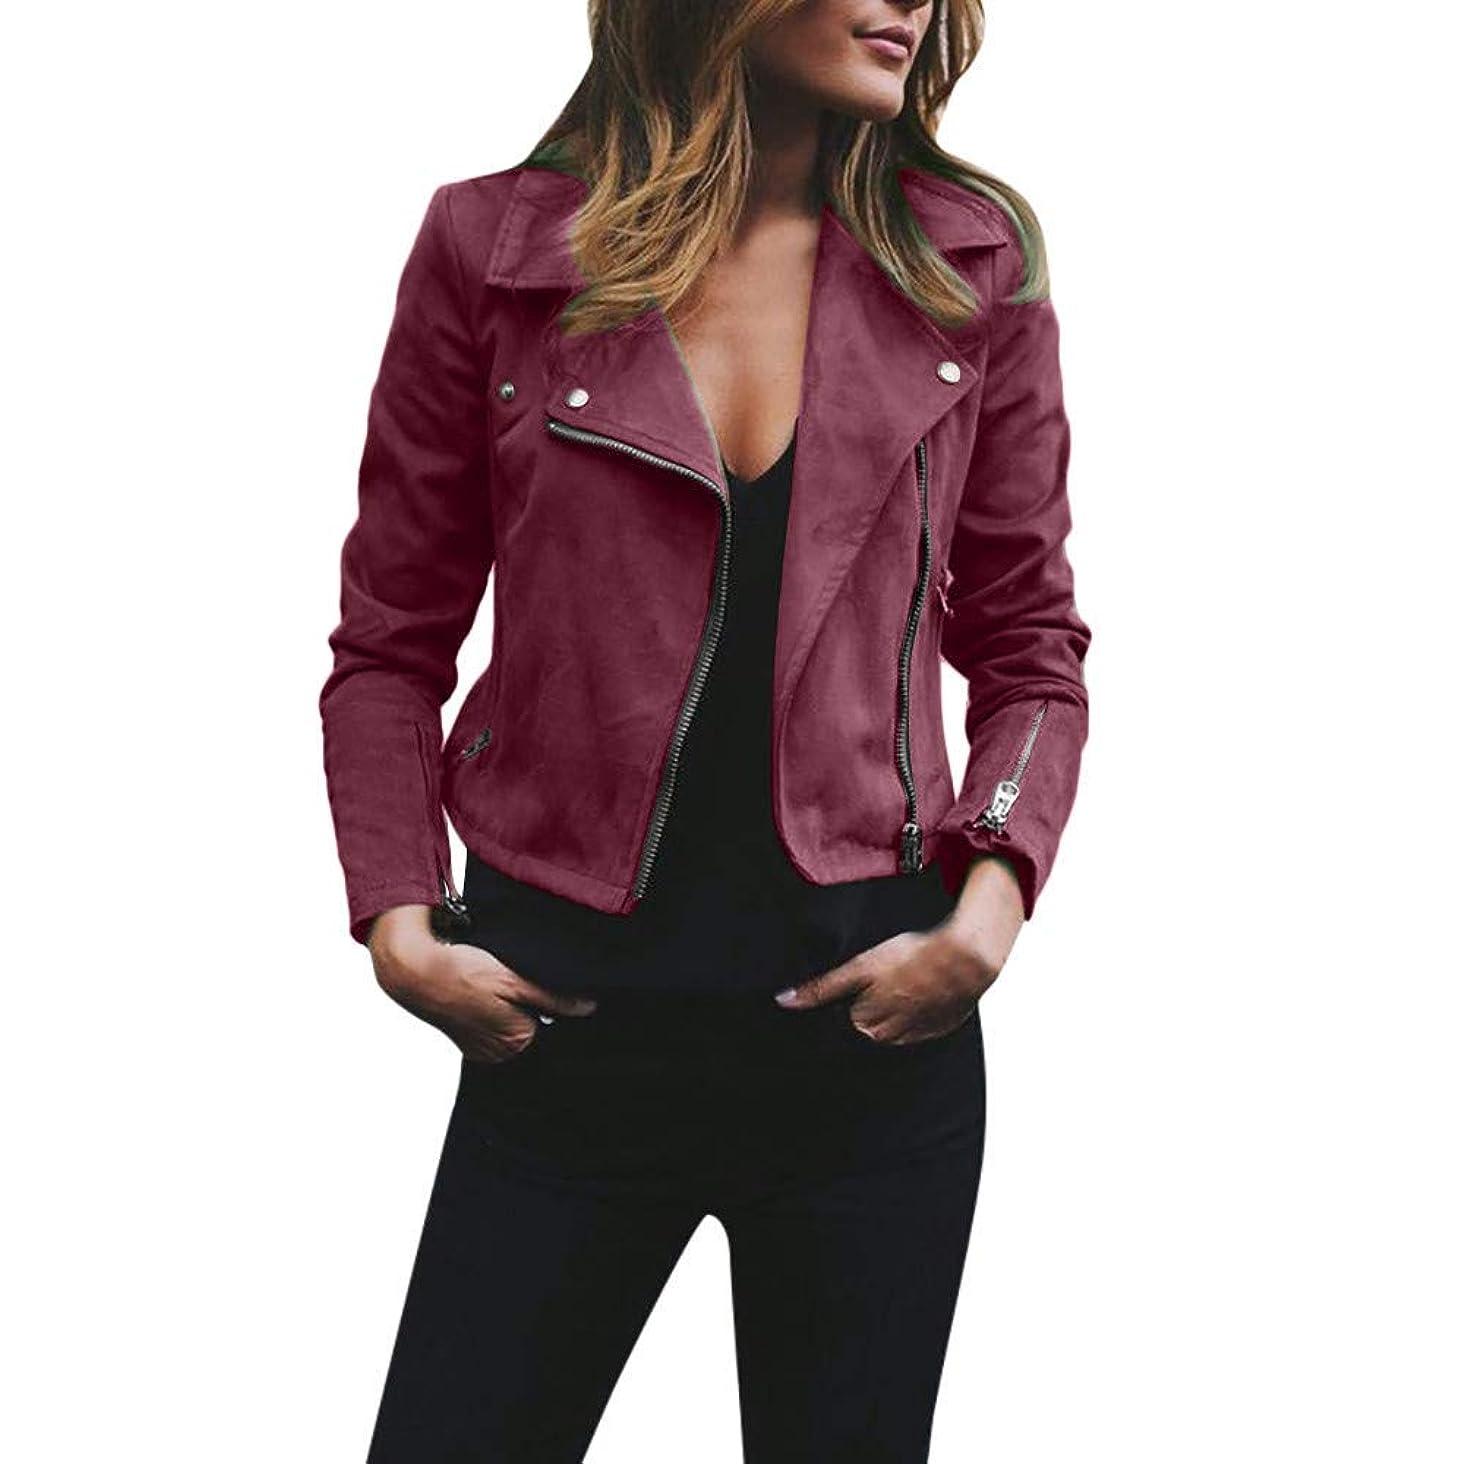 Womens Retro Jacket, Duseedik Ladies Rivet Zipper Up Bomber Casual Coat Outwear